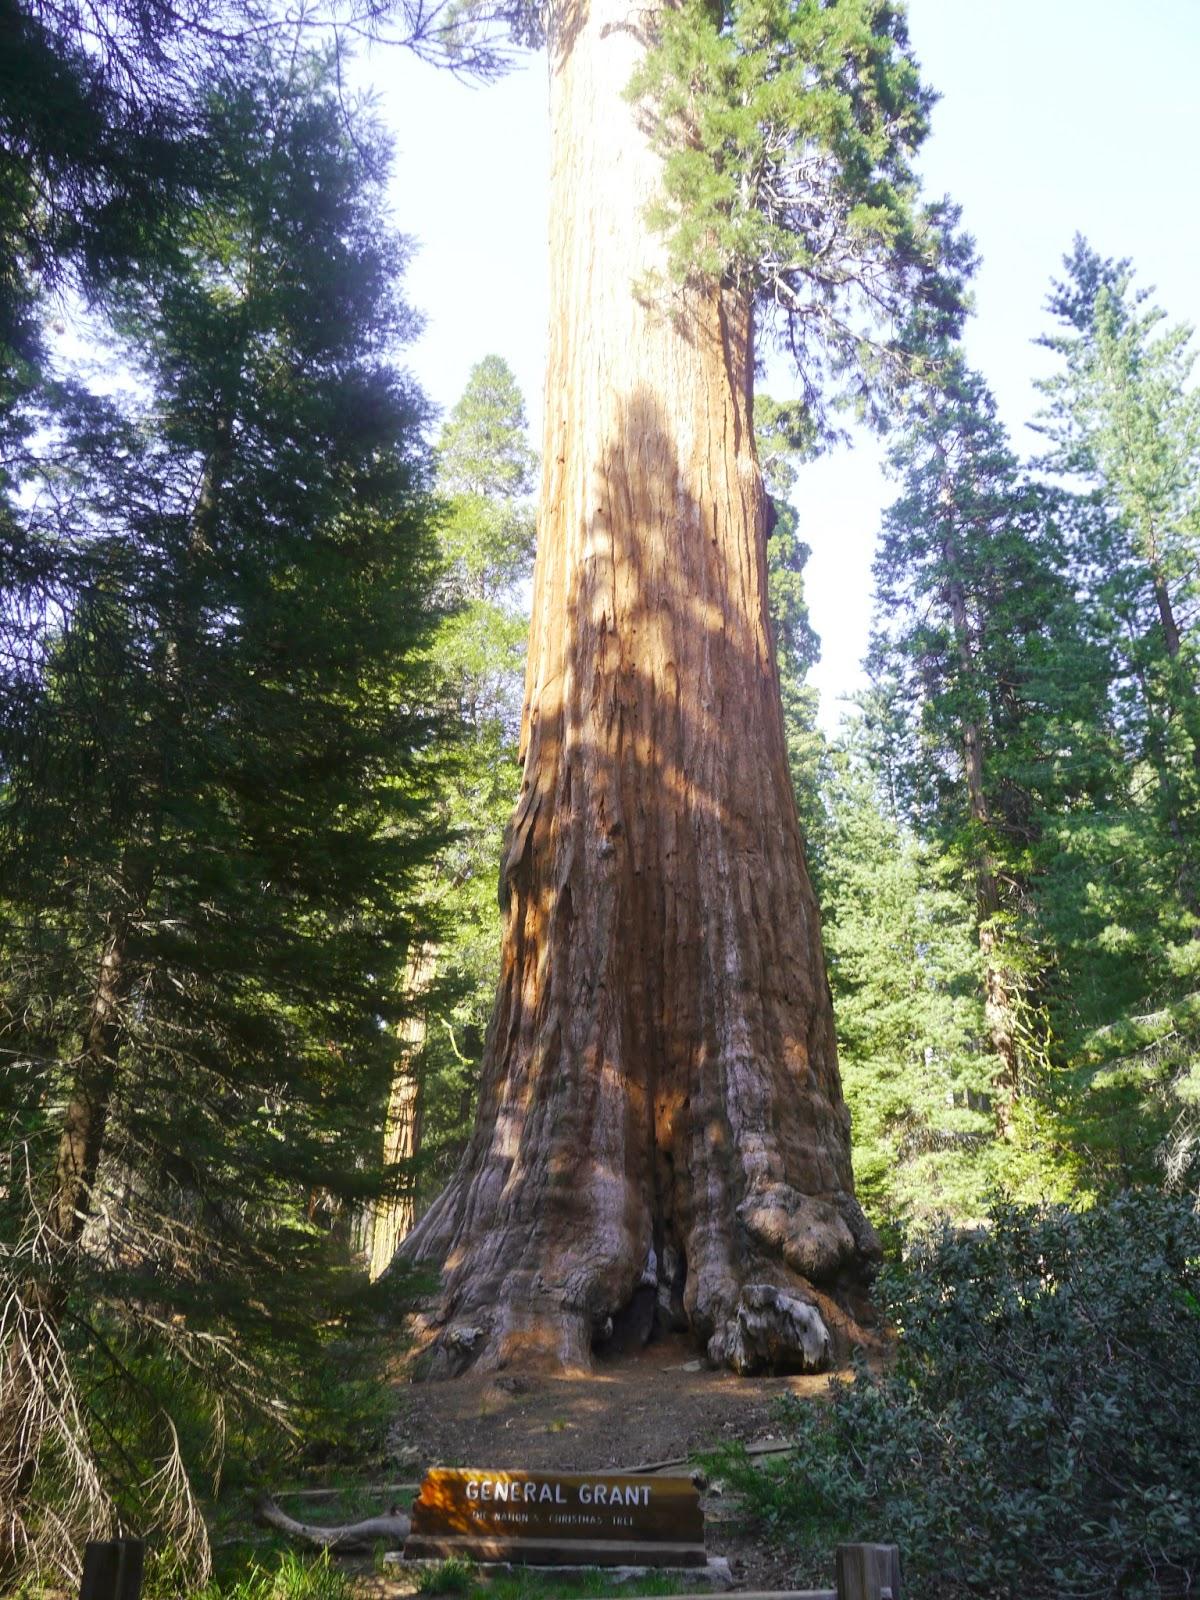 遊記: Sequoia National Park 紅杉國家公園